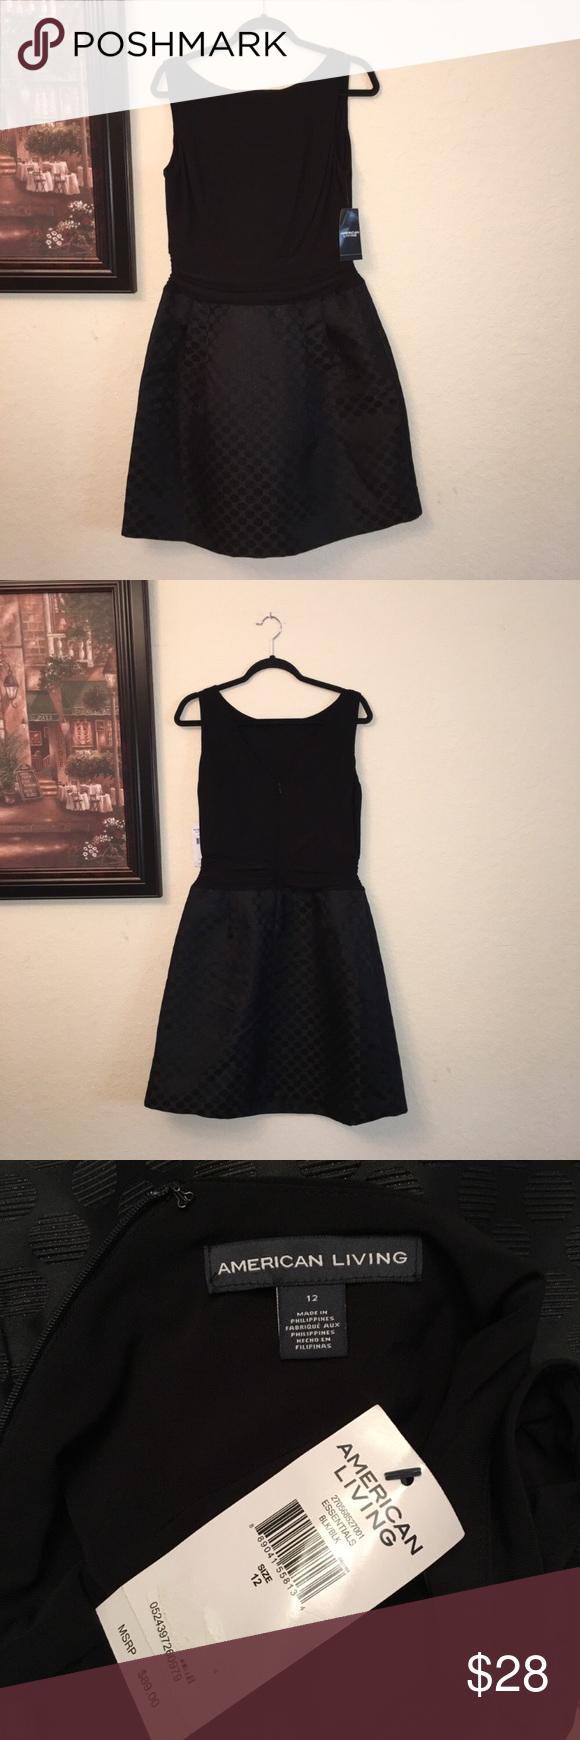 American Living Little Black Dress Size 12 Nwt Dresses Casual Winter Little Black Dress Casual Dresses For Women [ 1740 x 580 Pixel ]